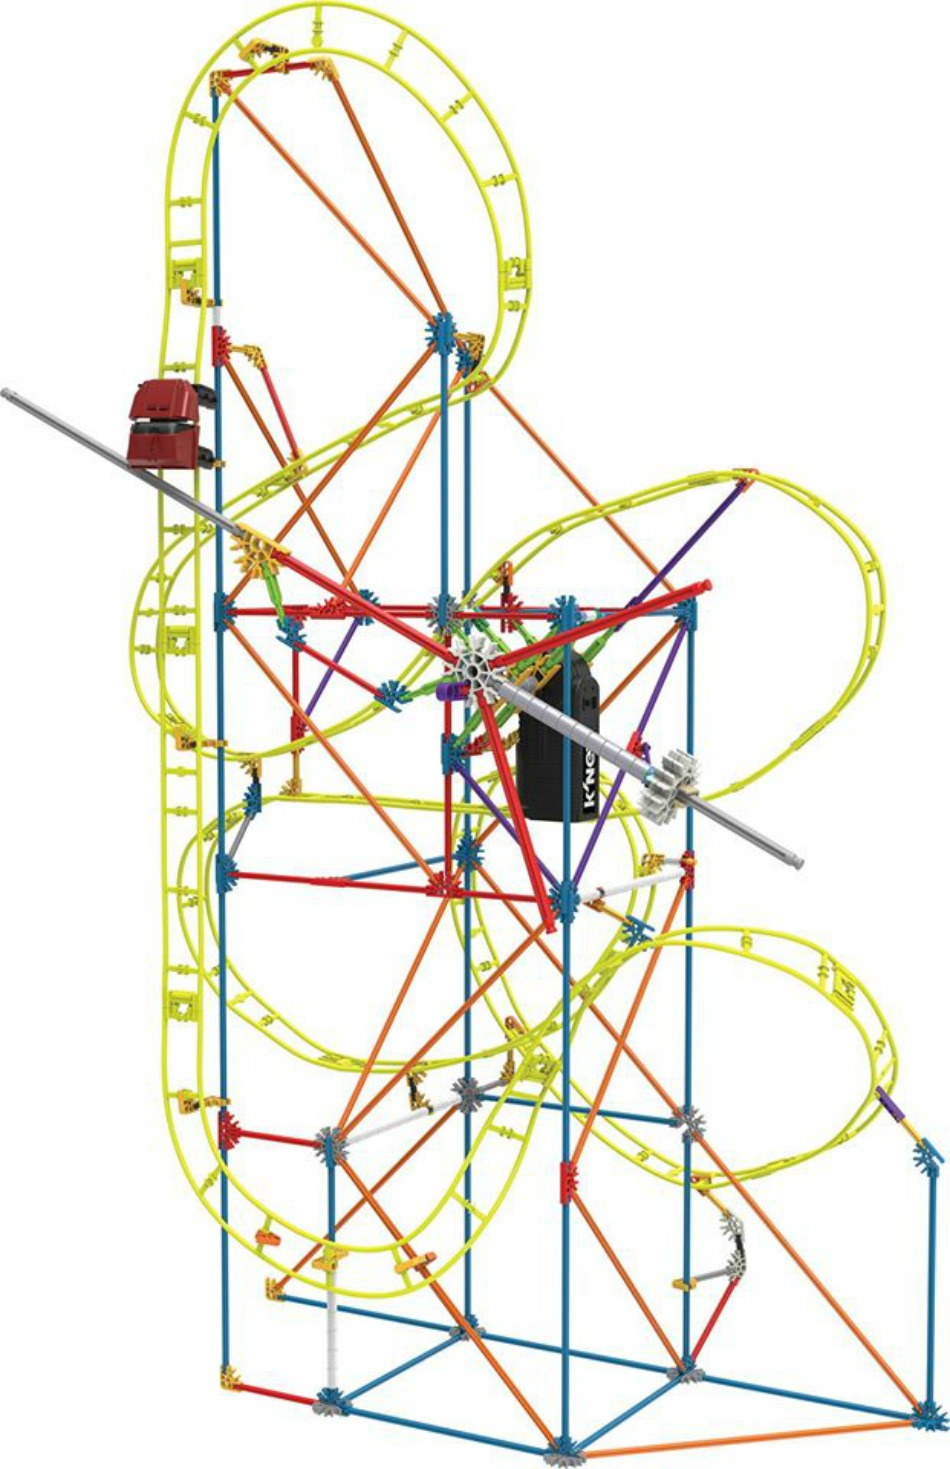 knex-clock-work-roller-coaster-build-set-1